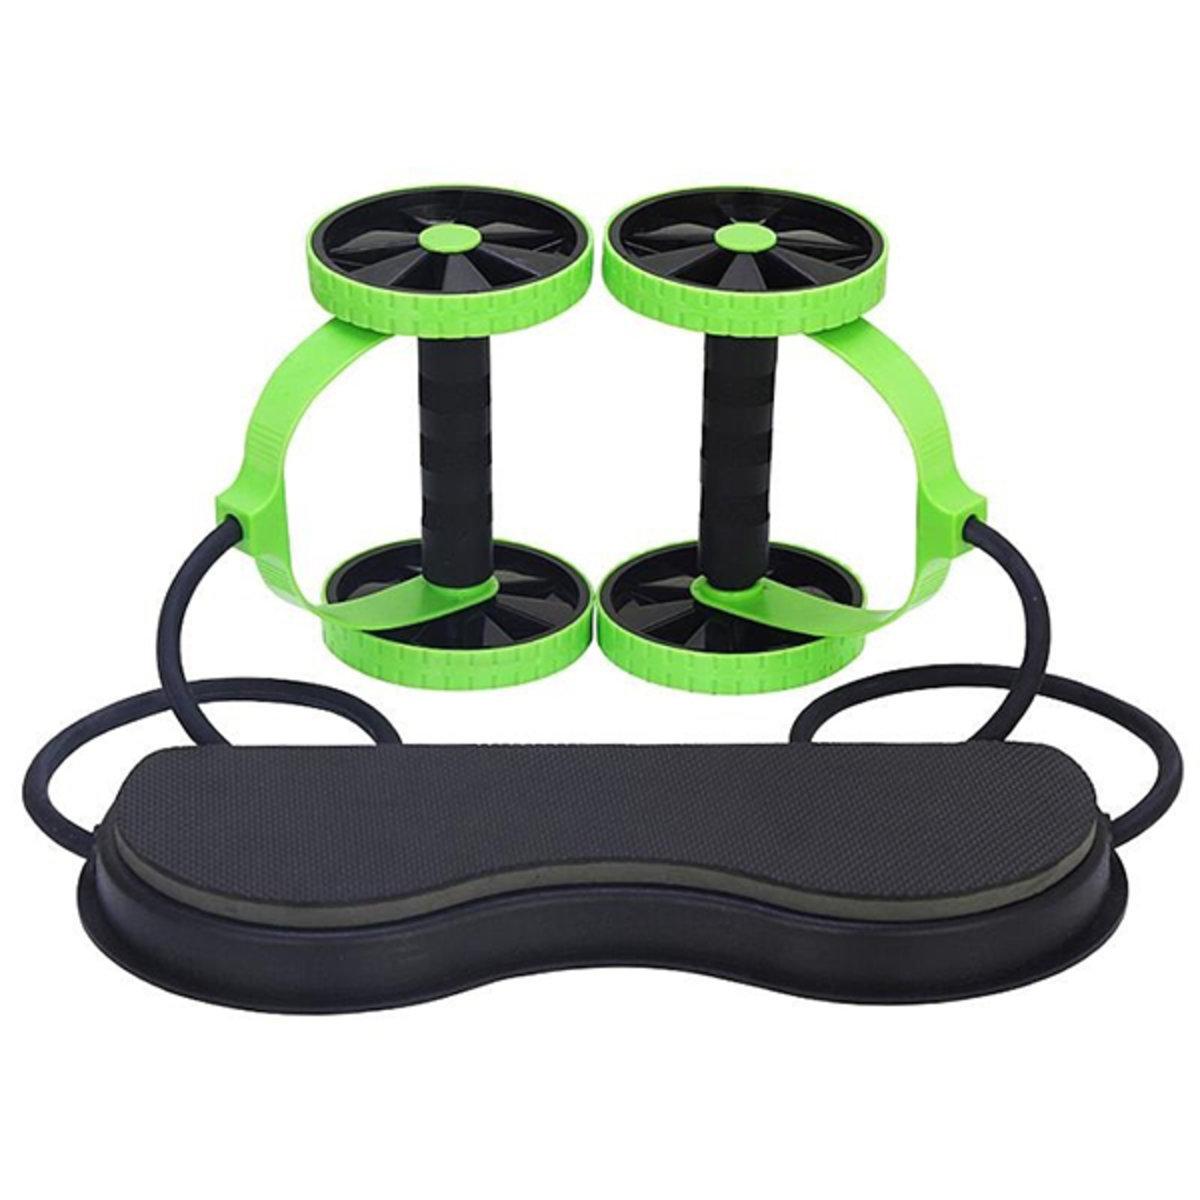 Multifunctional beauty waist double wheel mute tension rope